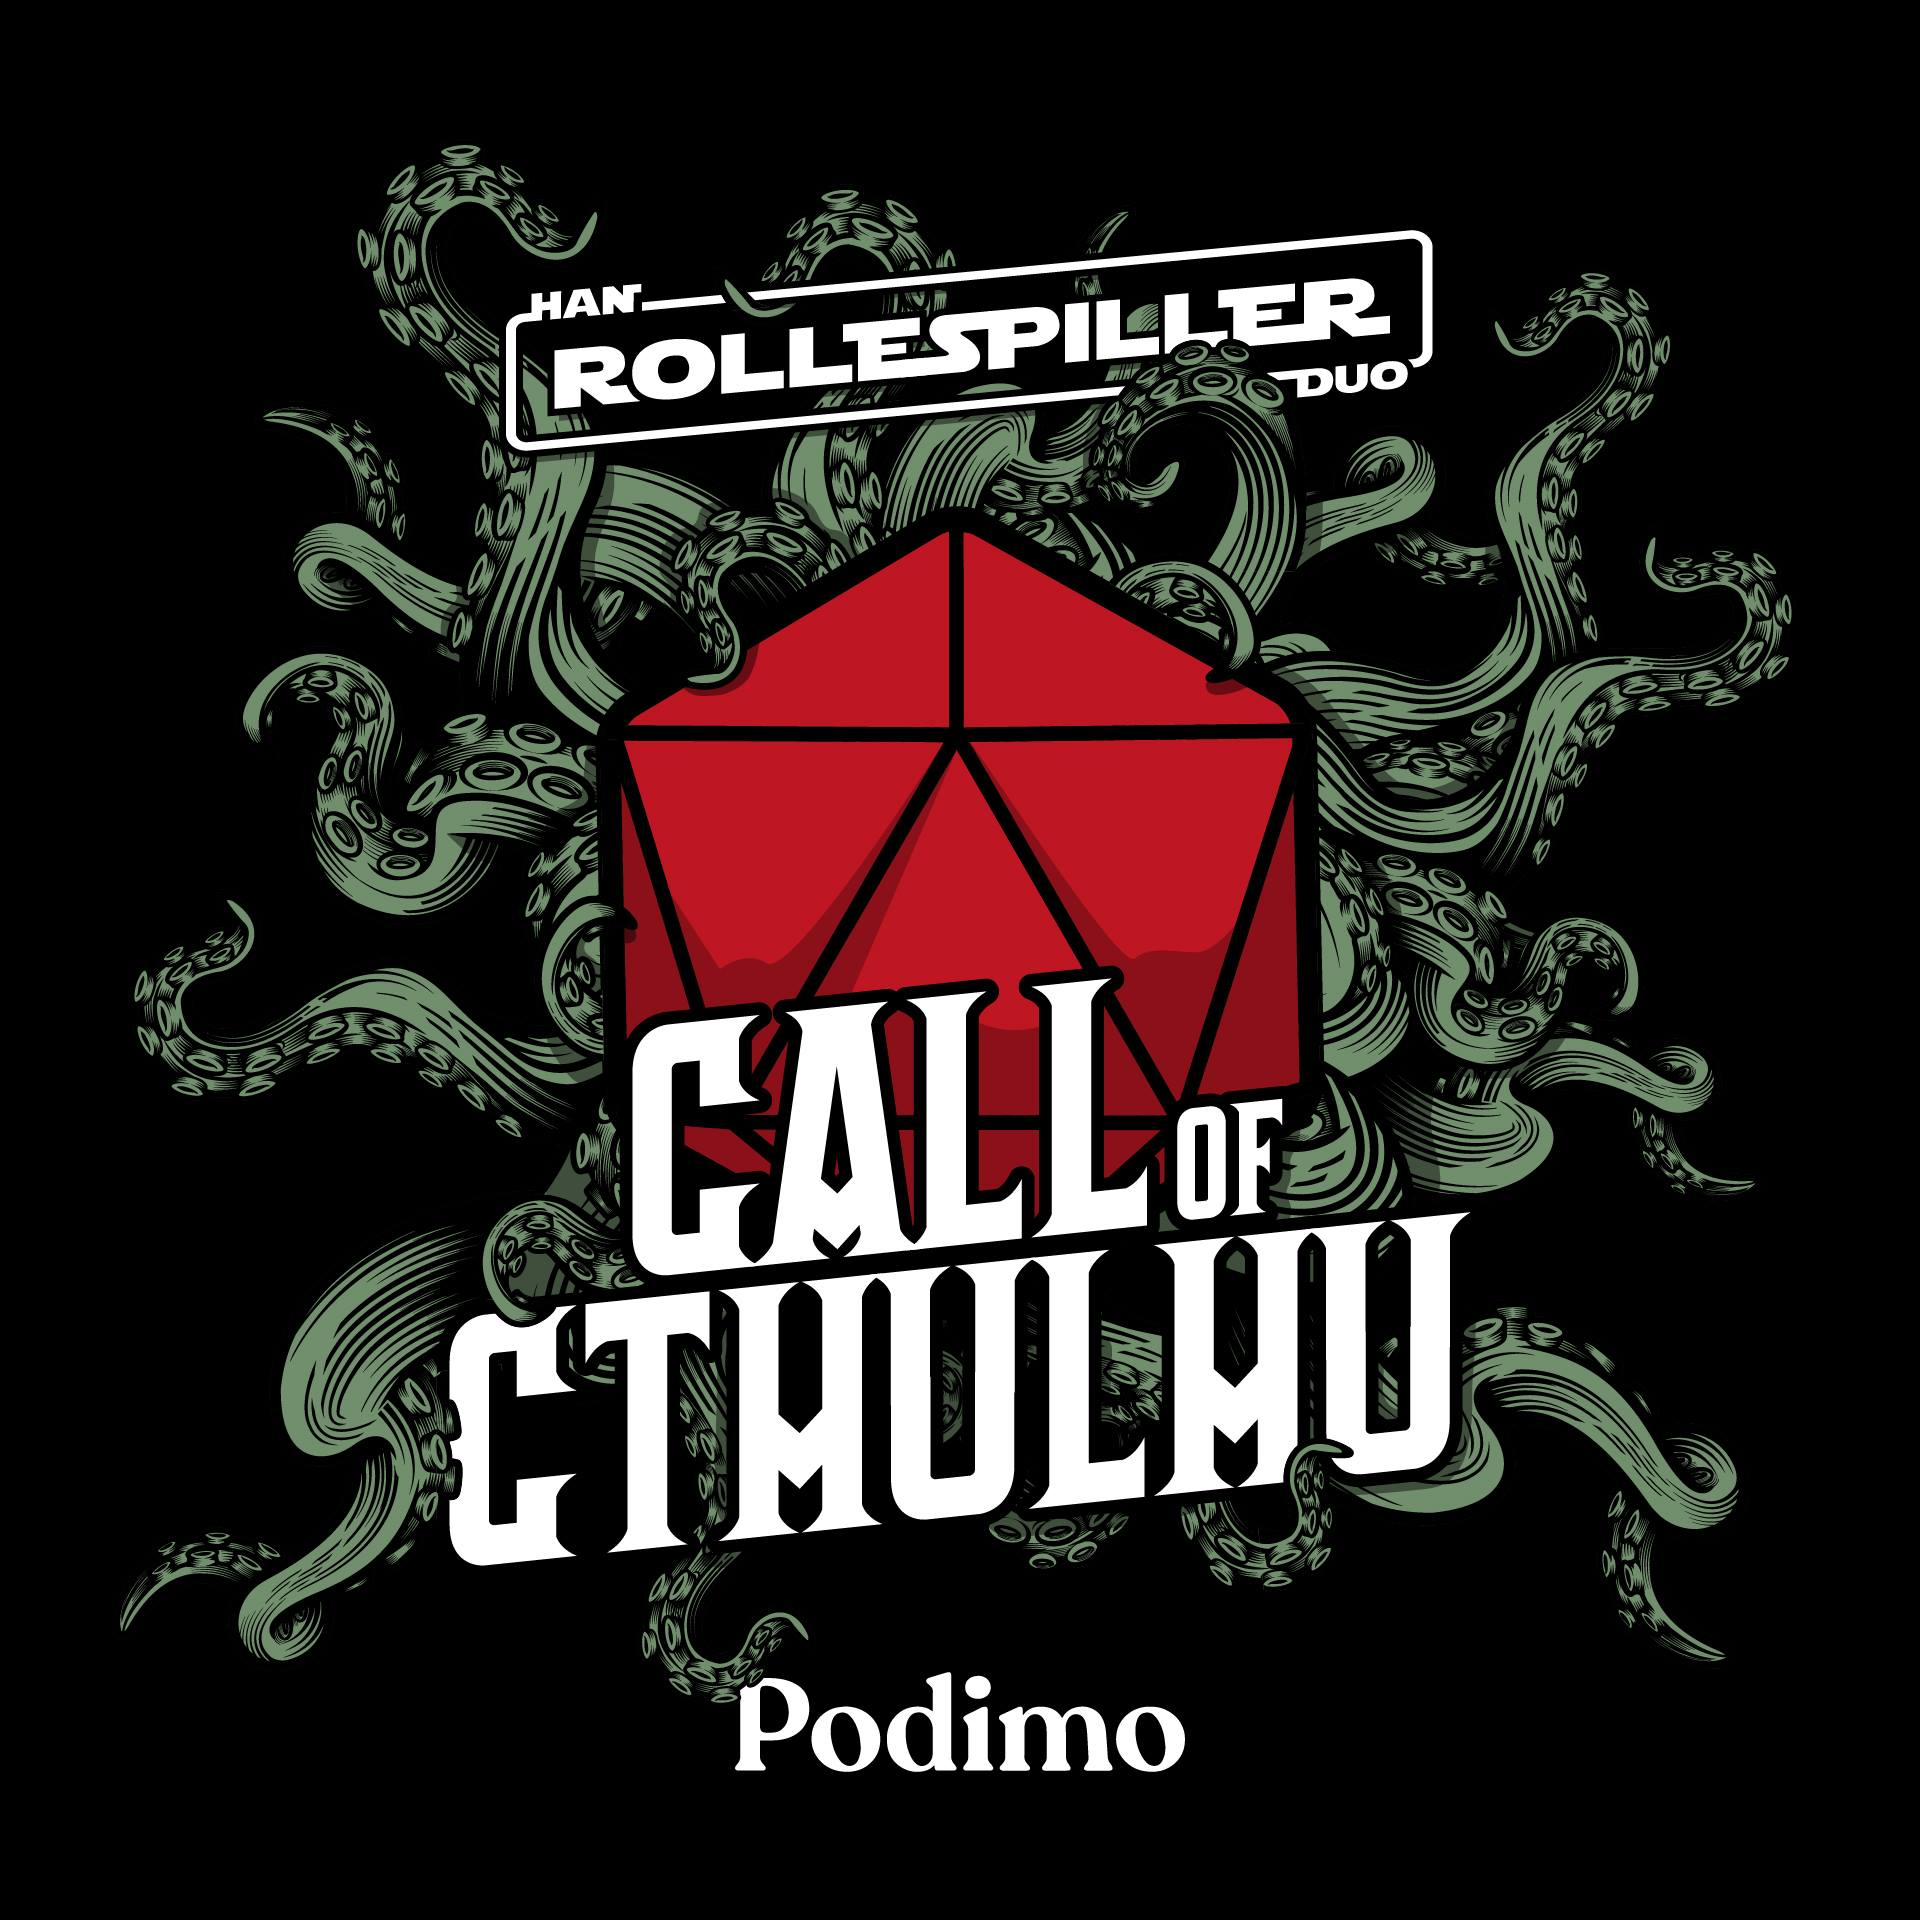 Han Duo Rollespiller: Call of Cthulhu 1:4